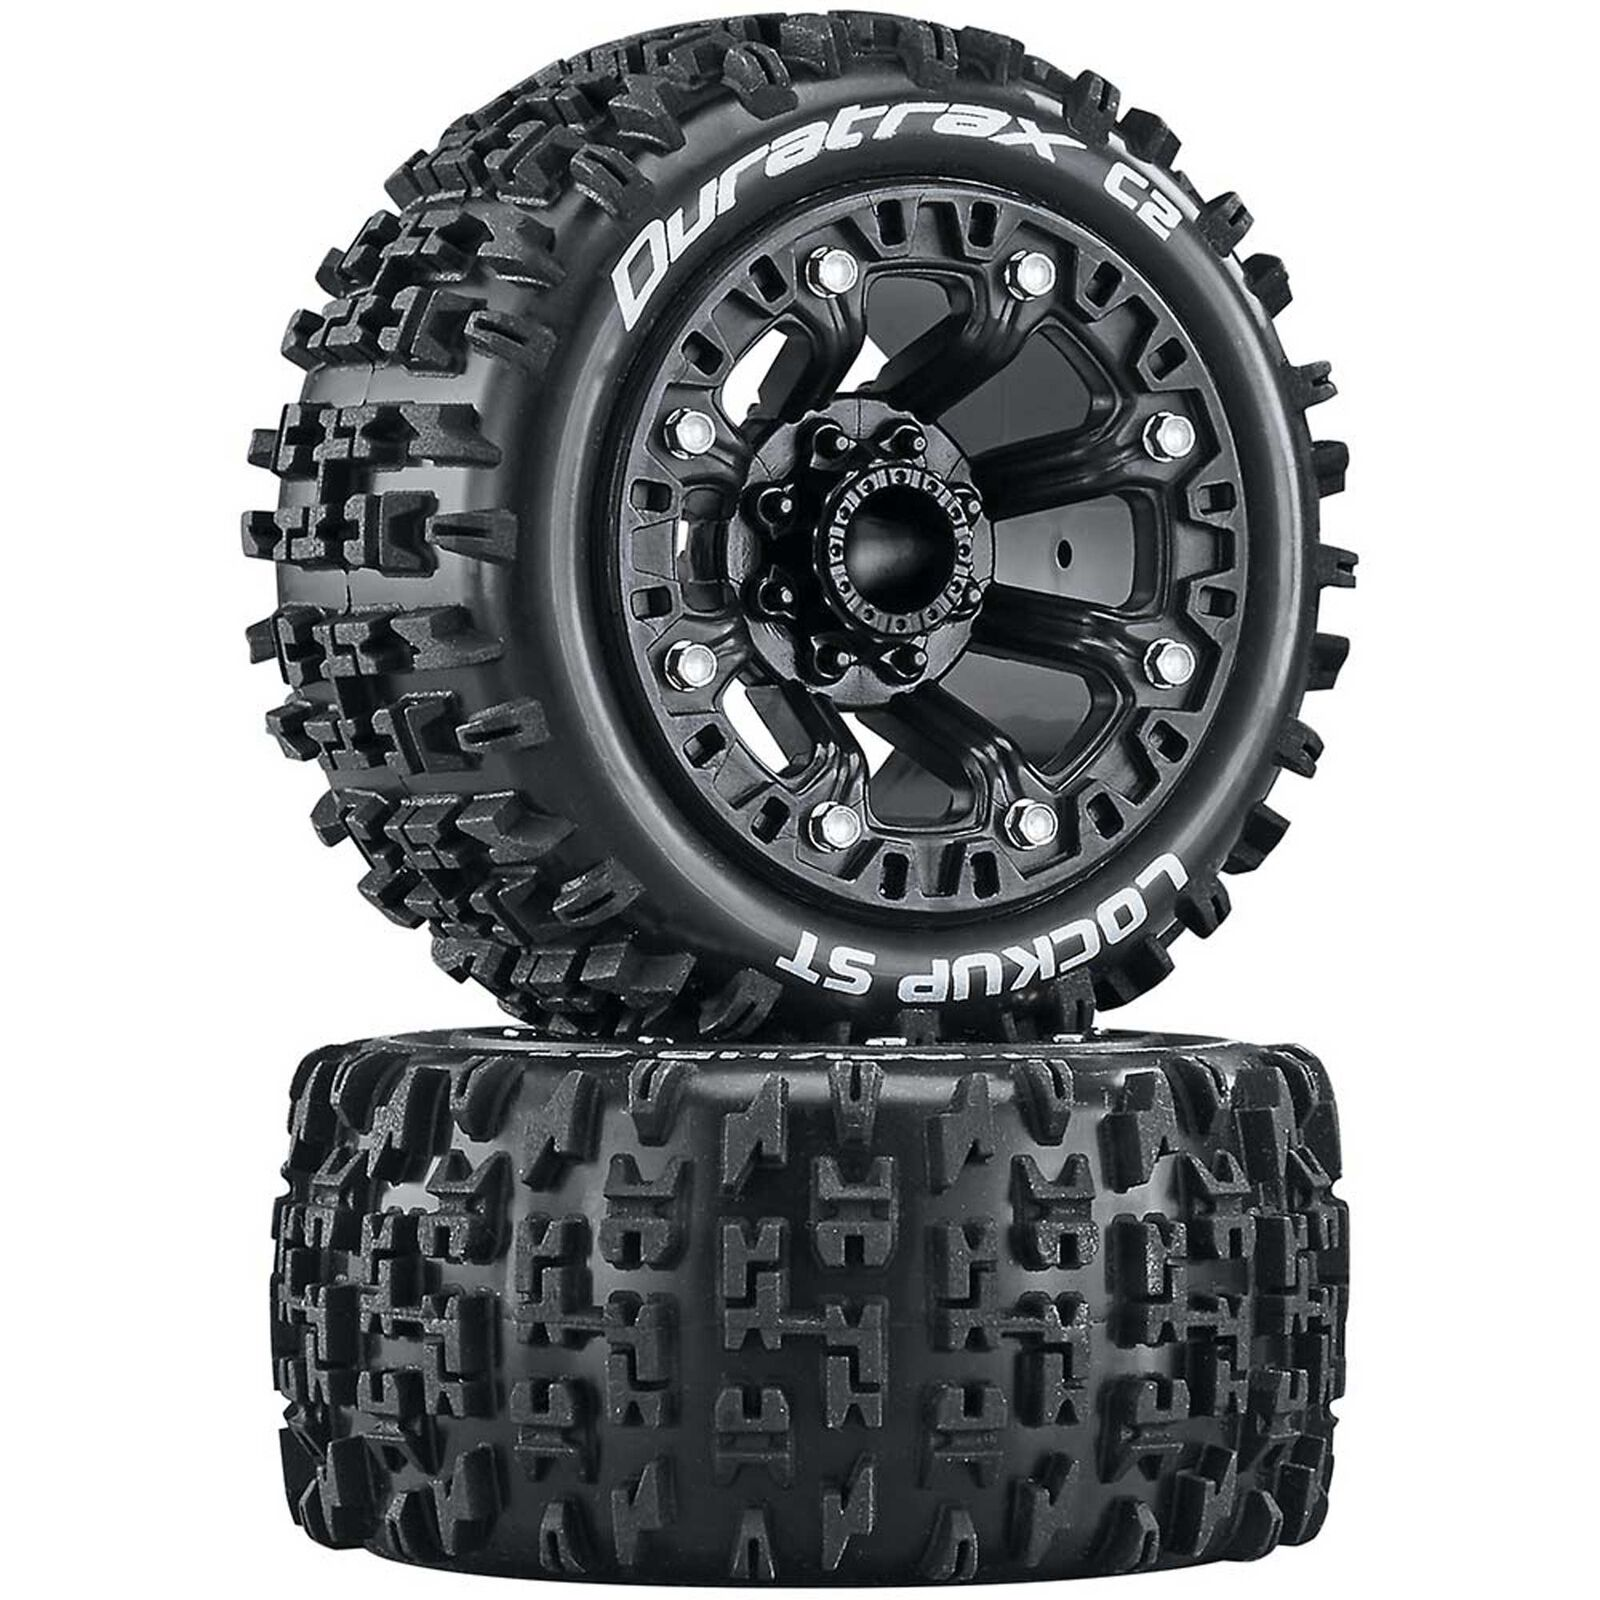 Lockup ST 2.2 Tires, Black (2)